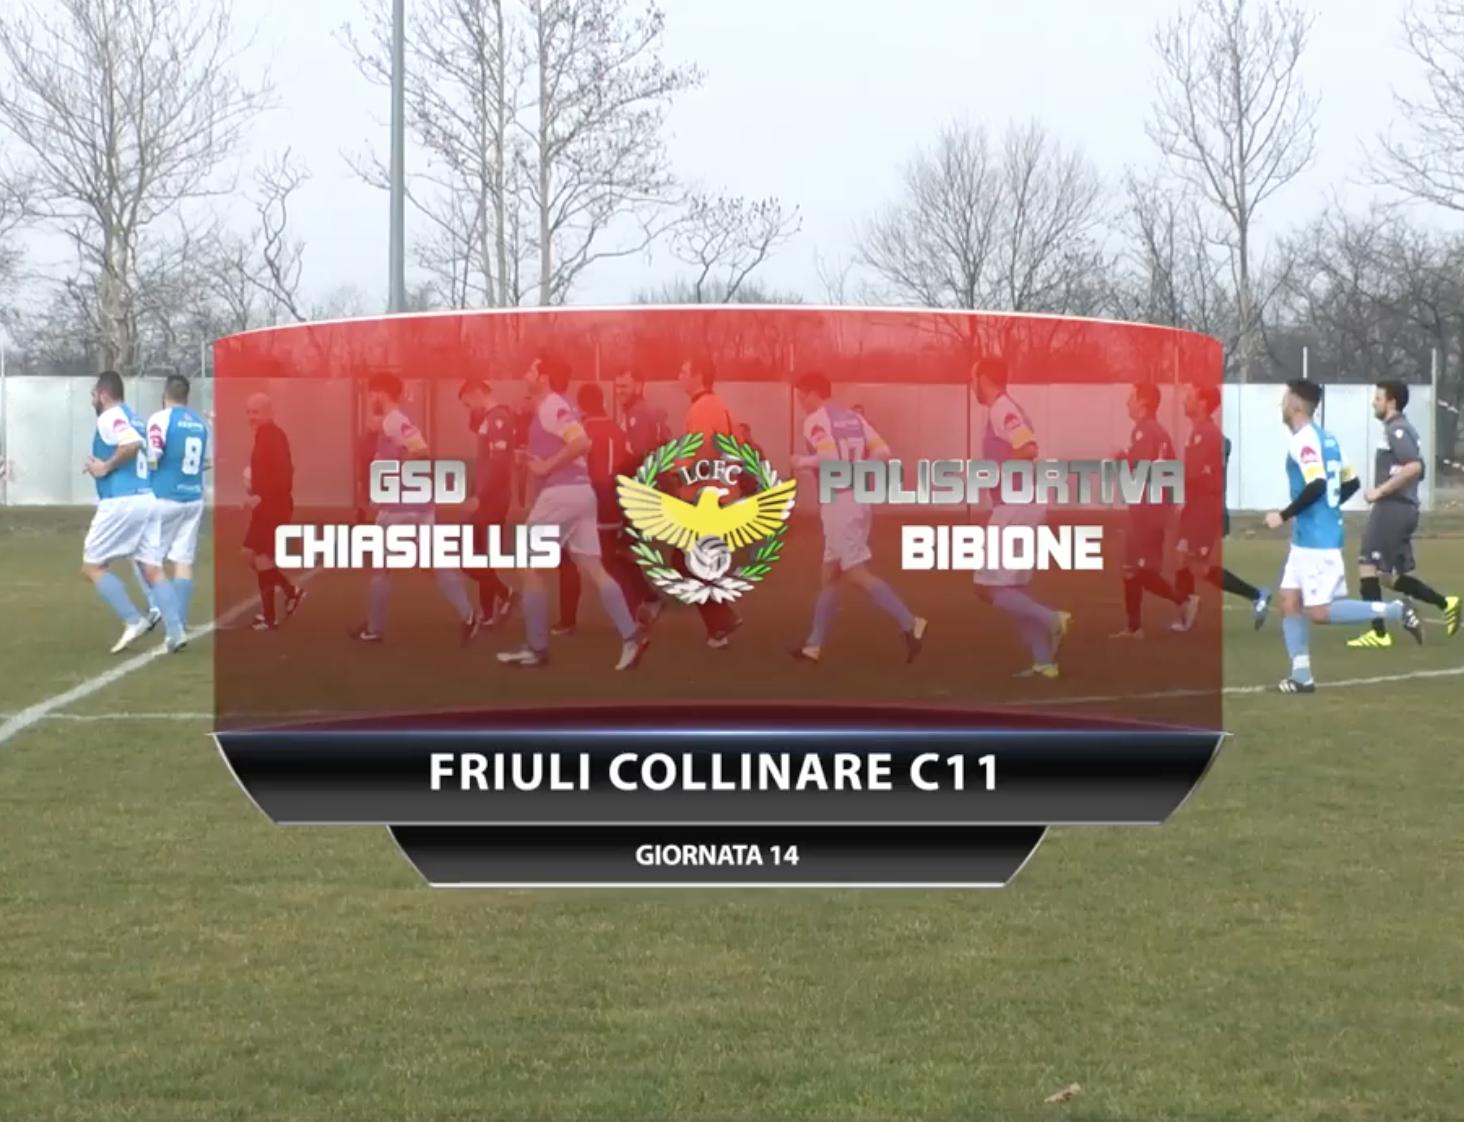 VIDEO: GSD Chiasiellis VS Polisportiva Bibione